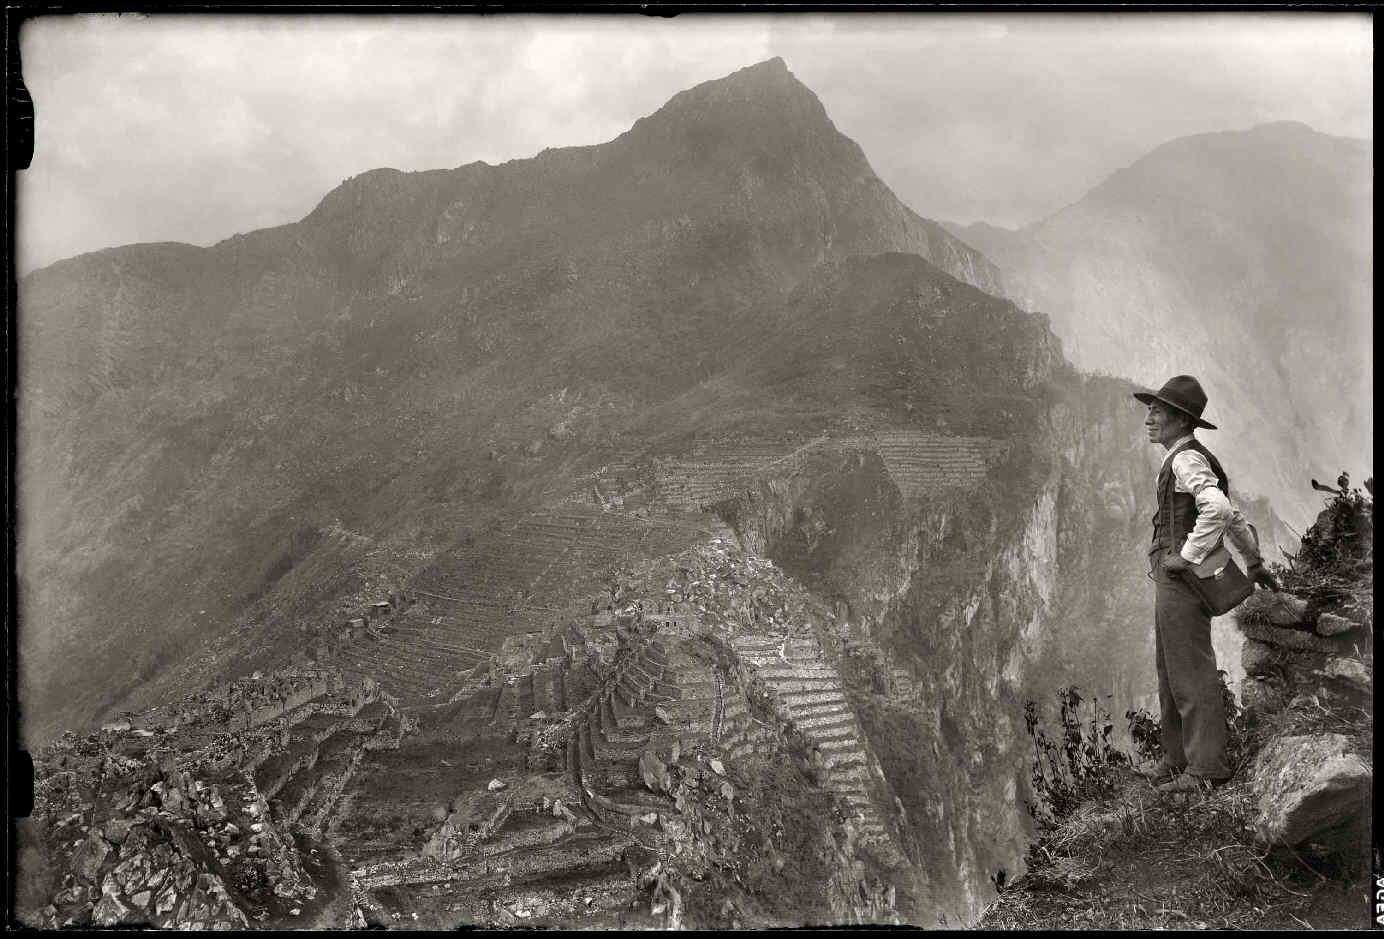 CHAMBI, Martín, <i>Autorretrato de Martín Chambi en Wayna Picchu</i>